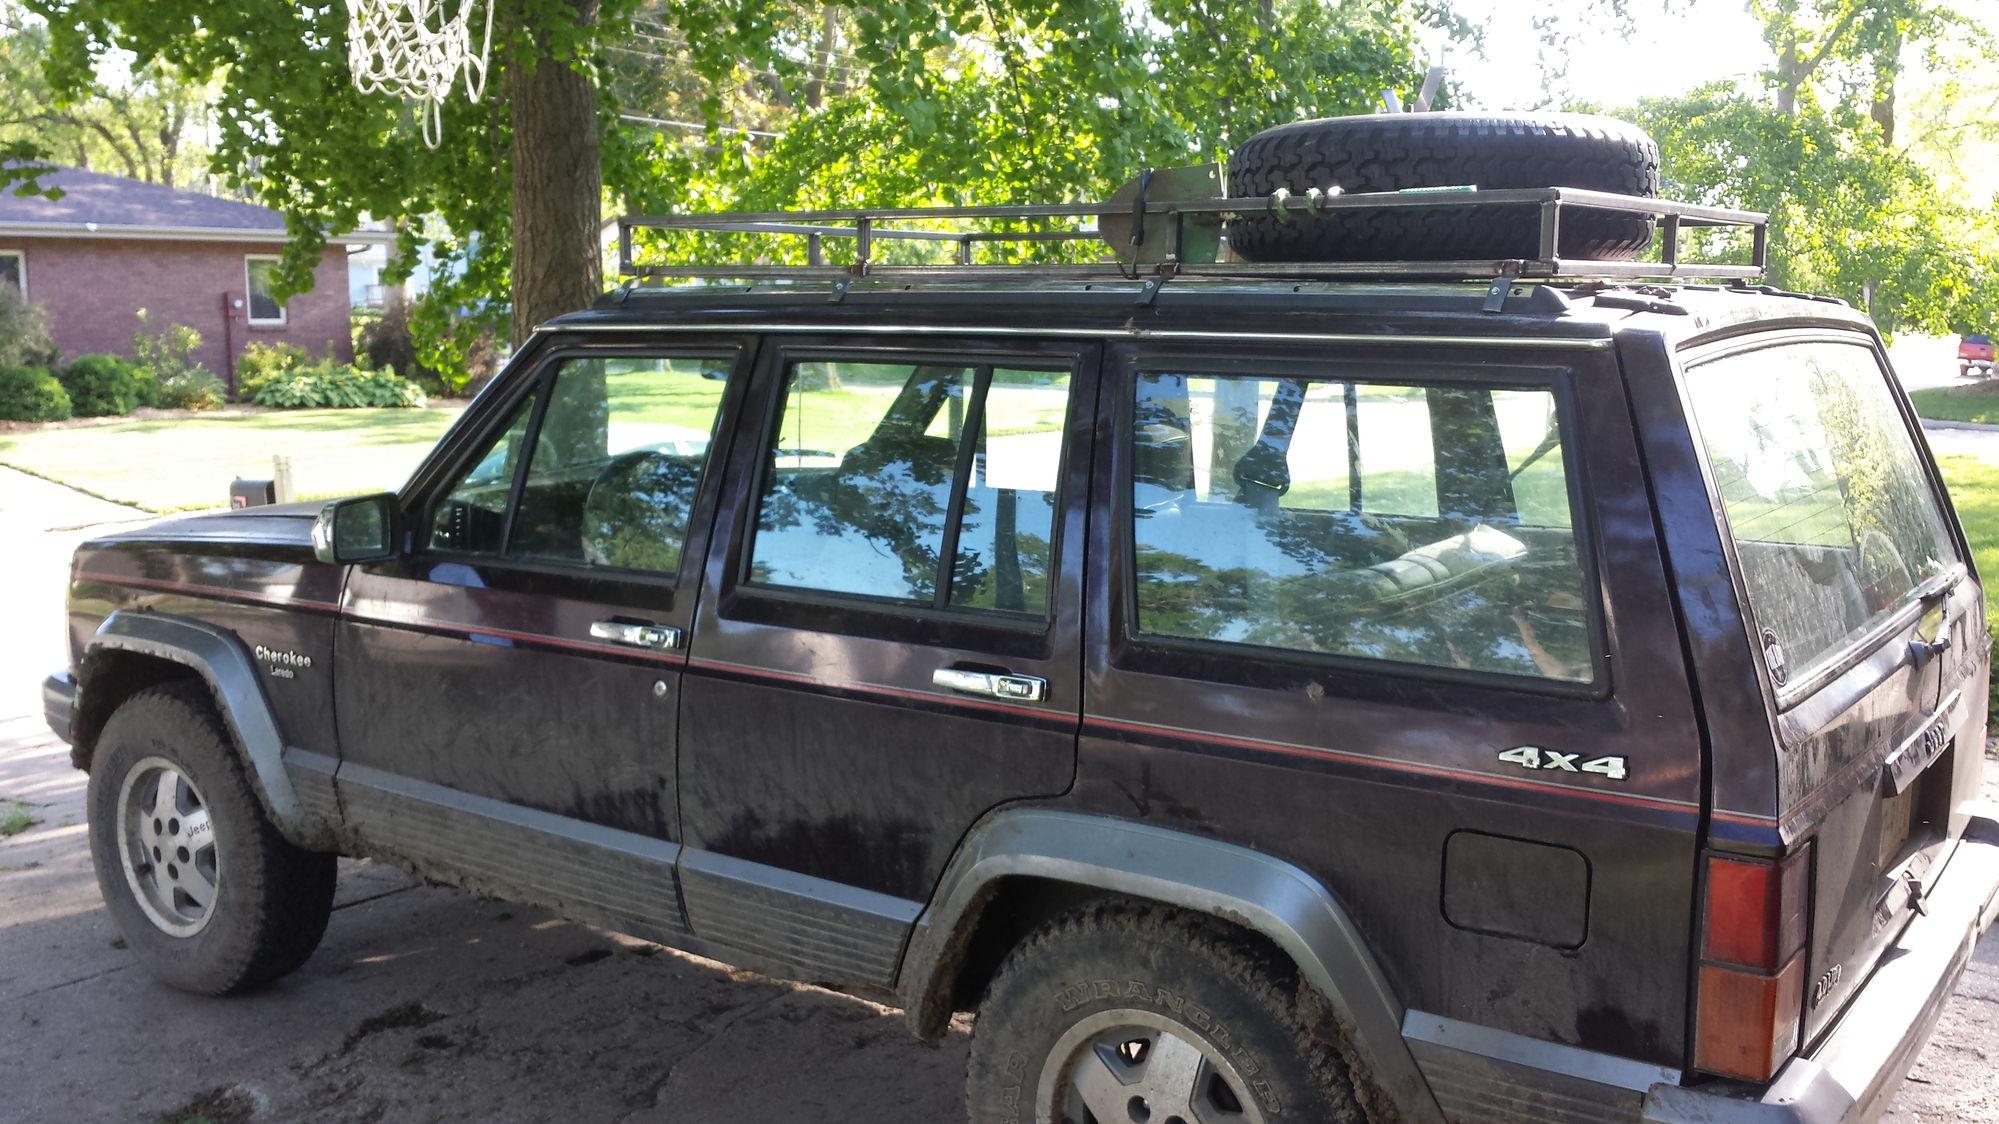 1991 jeep cherokee laredo roof rack jeep cherokee forum. Black Bedroom Furniture Sets. Home Design Ideas